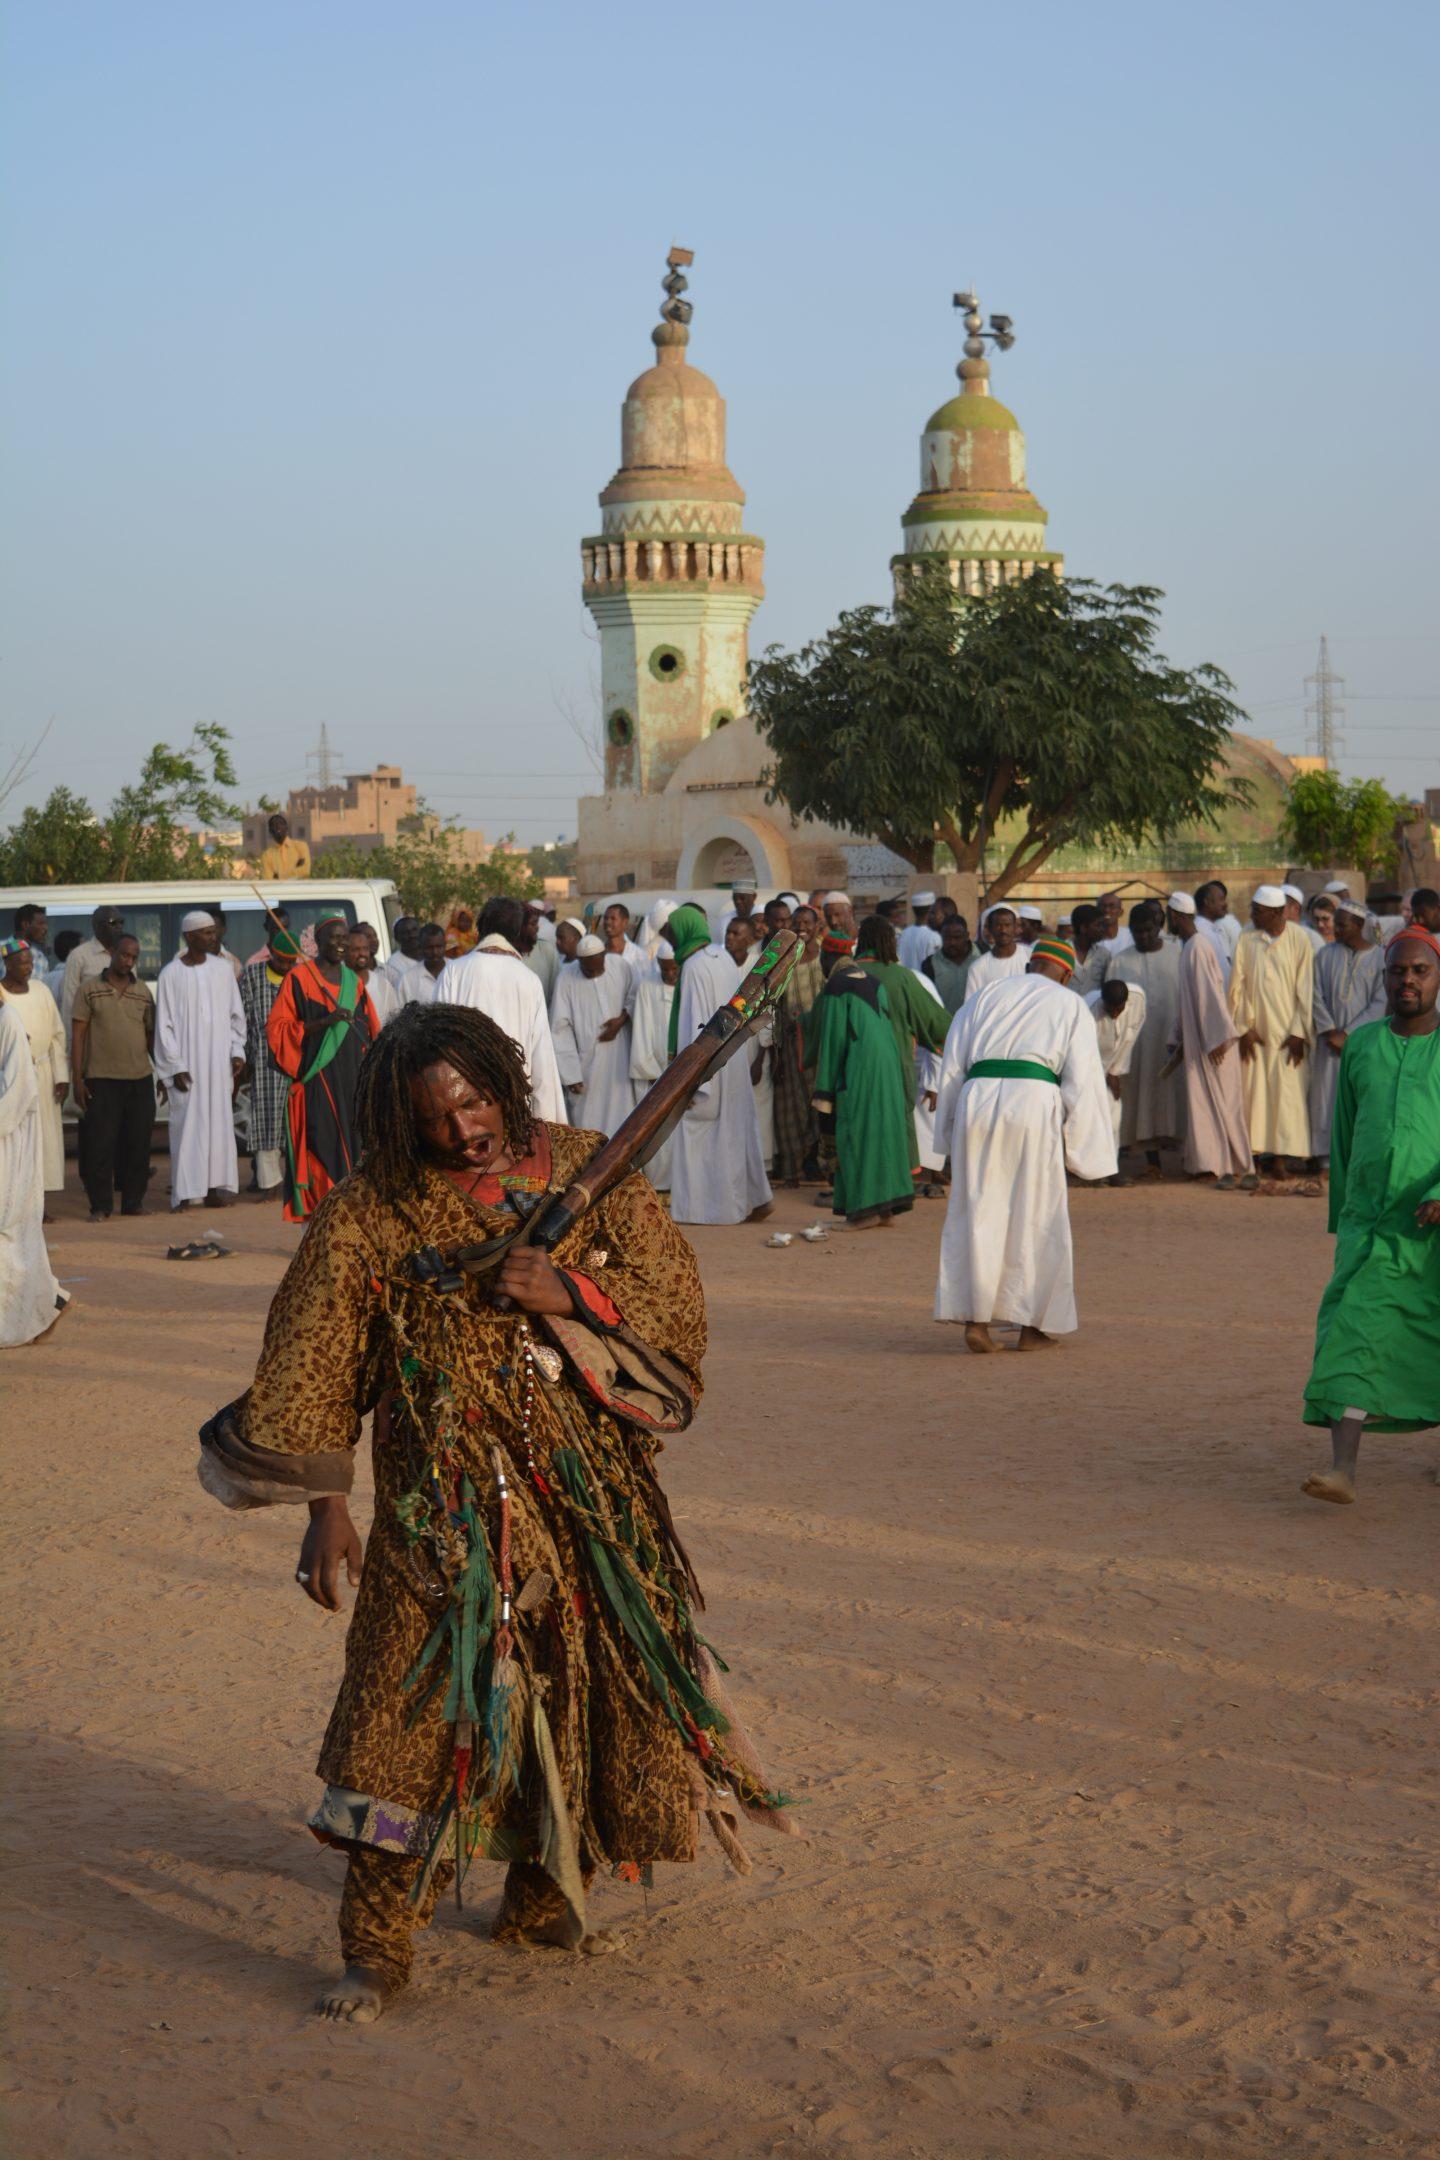 Dhikr, Hamad el-Nil, Khartoum, Sudan